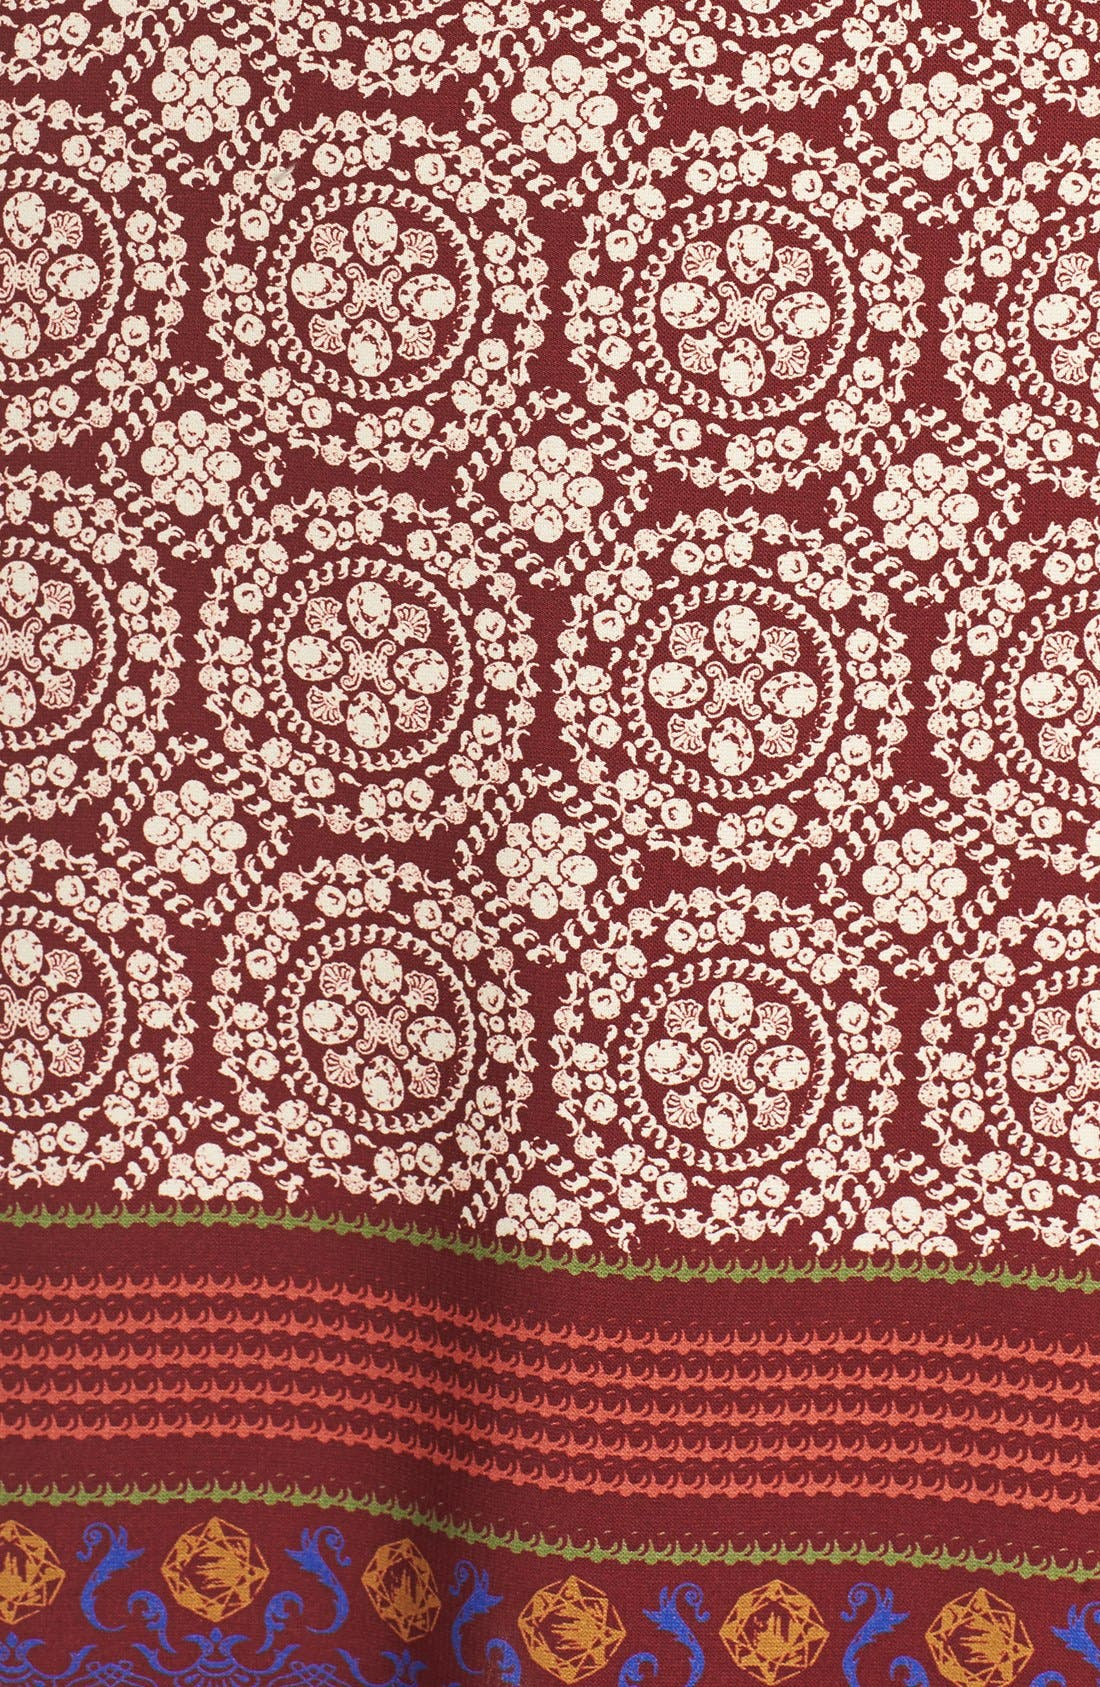 'Nora' Print Woven Shift Dress,                             Alternate thumbnail 5, color,                             939